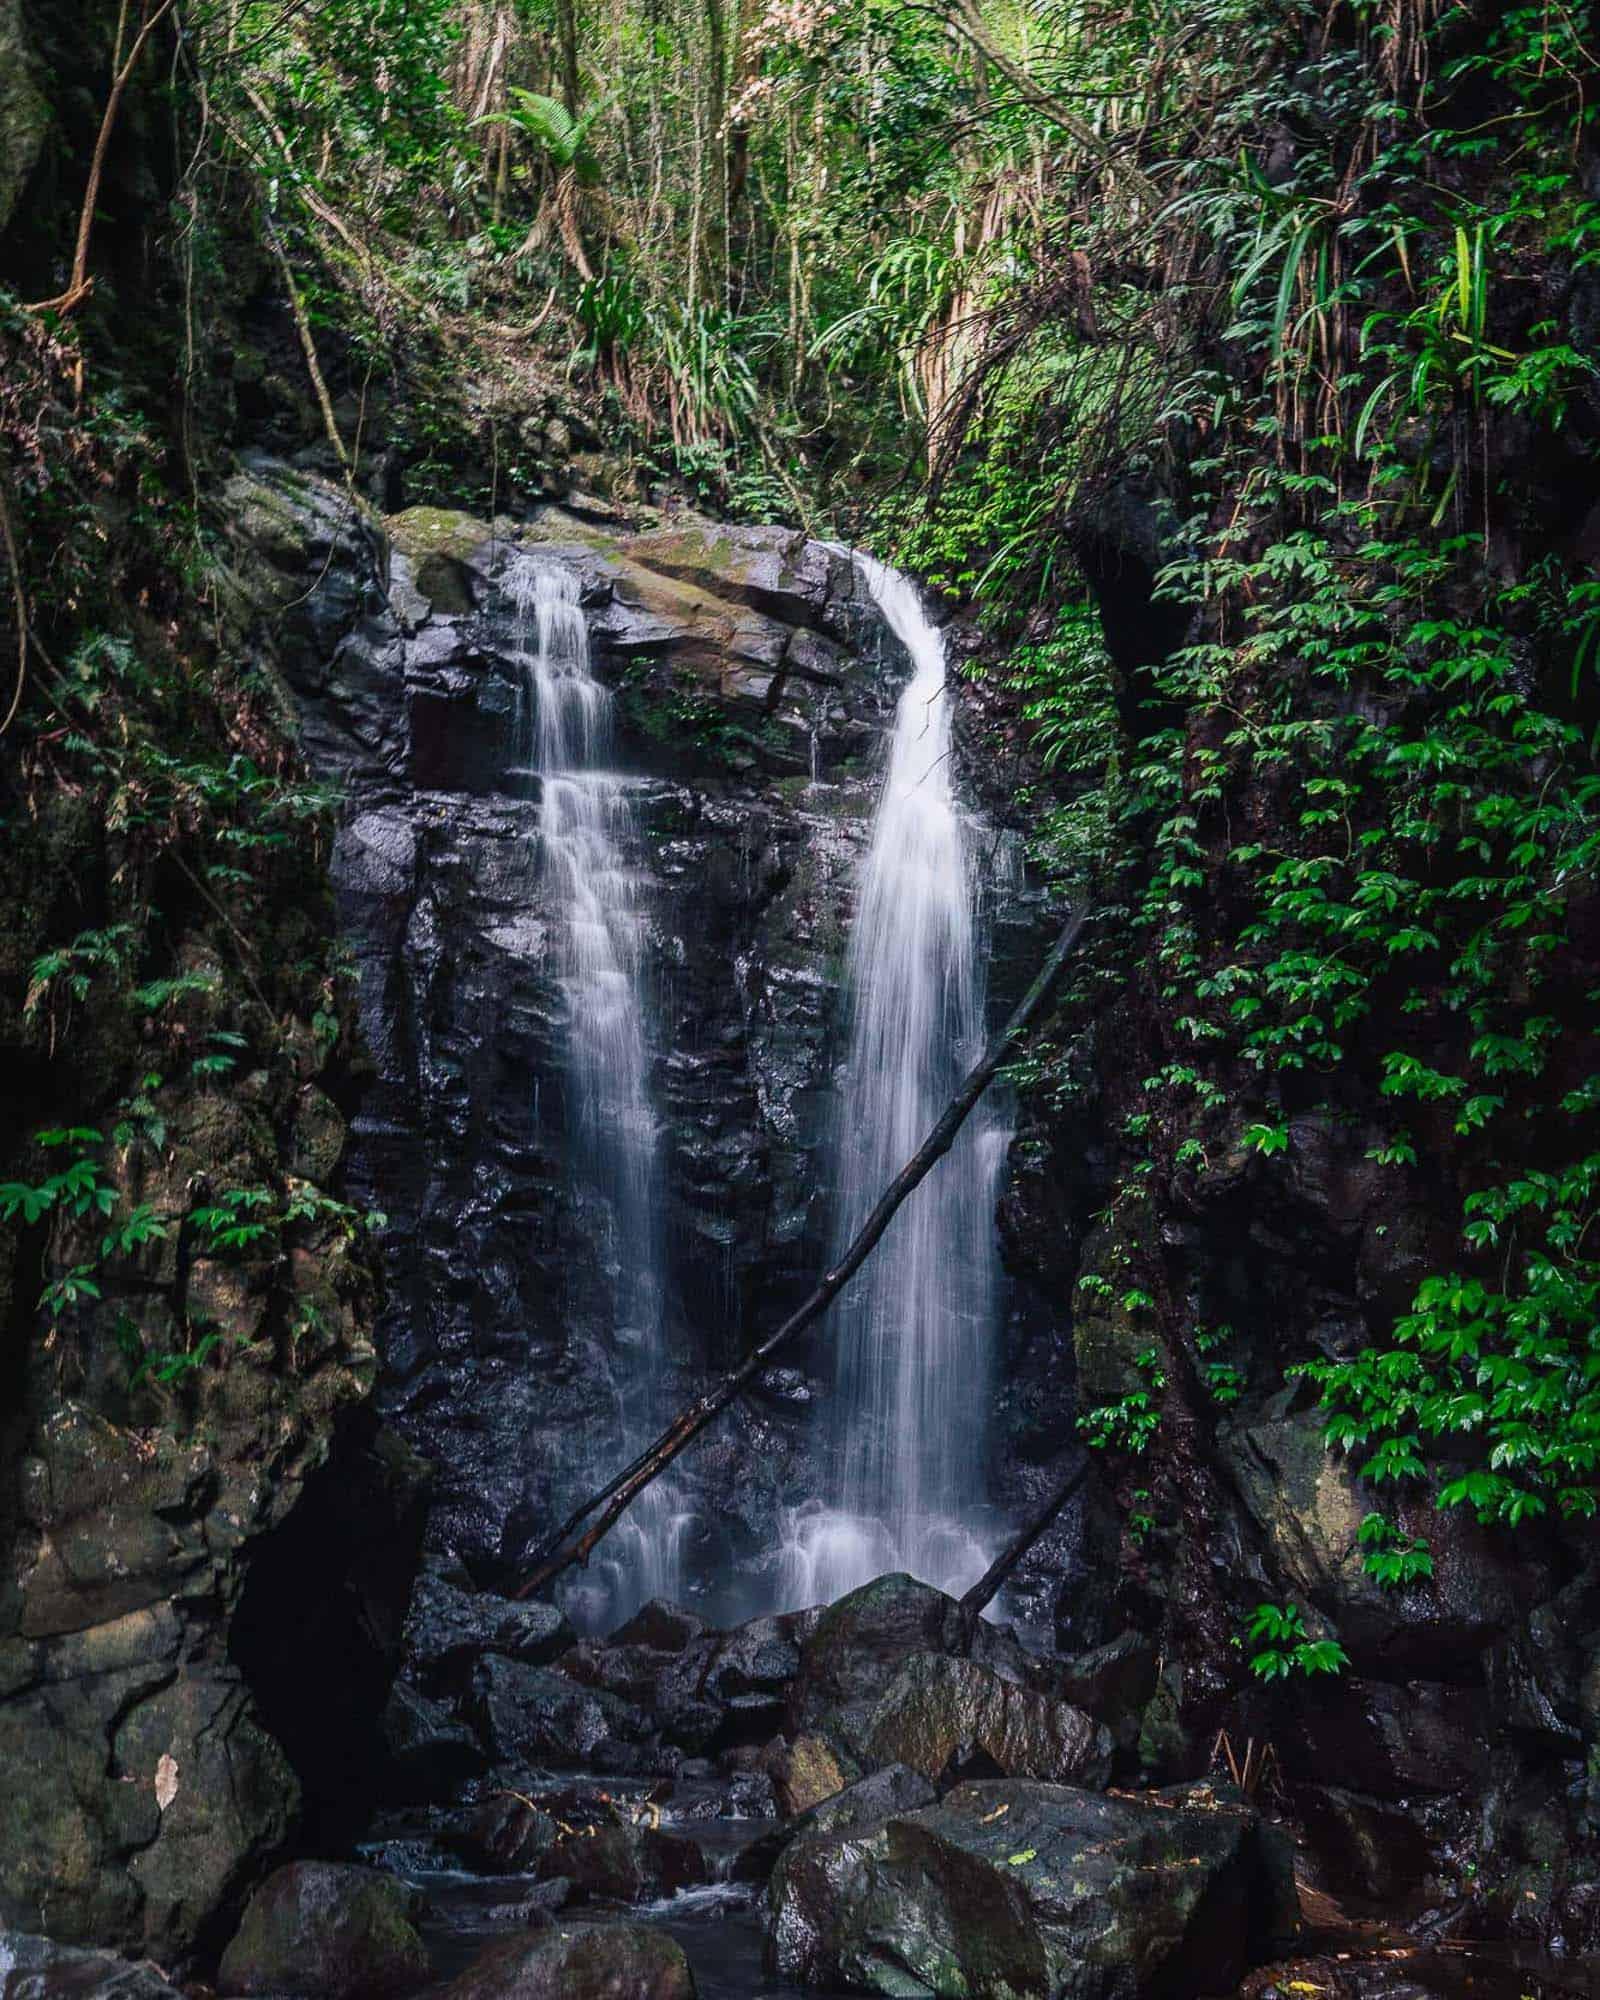 box log falls, box forest circuit, lamington national park walks, lamington national park, lamington national park hikes, oreillys rainforest retreat